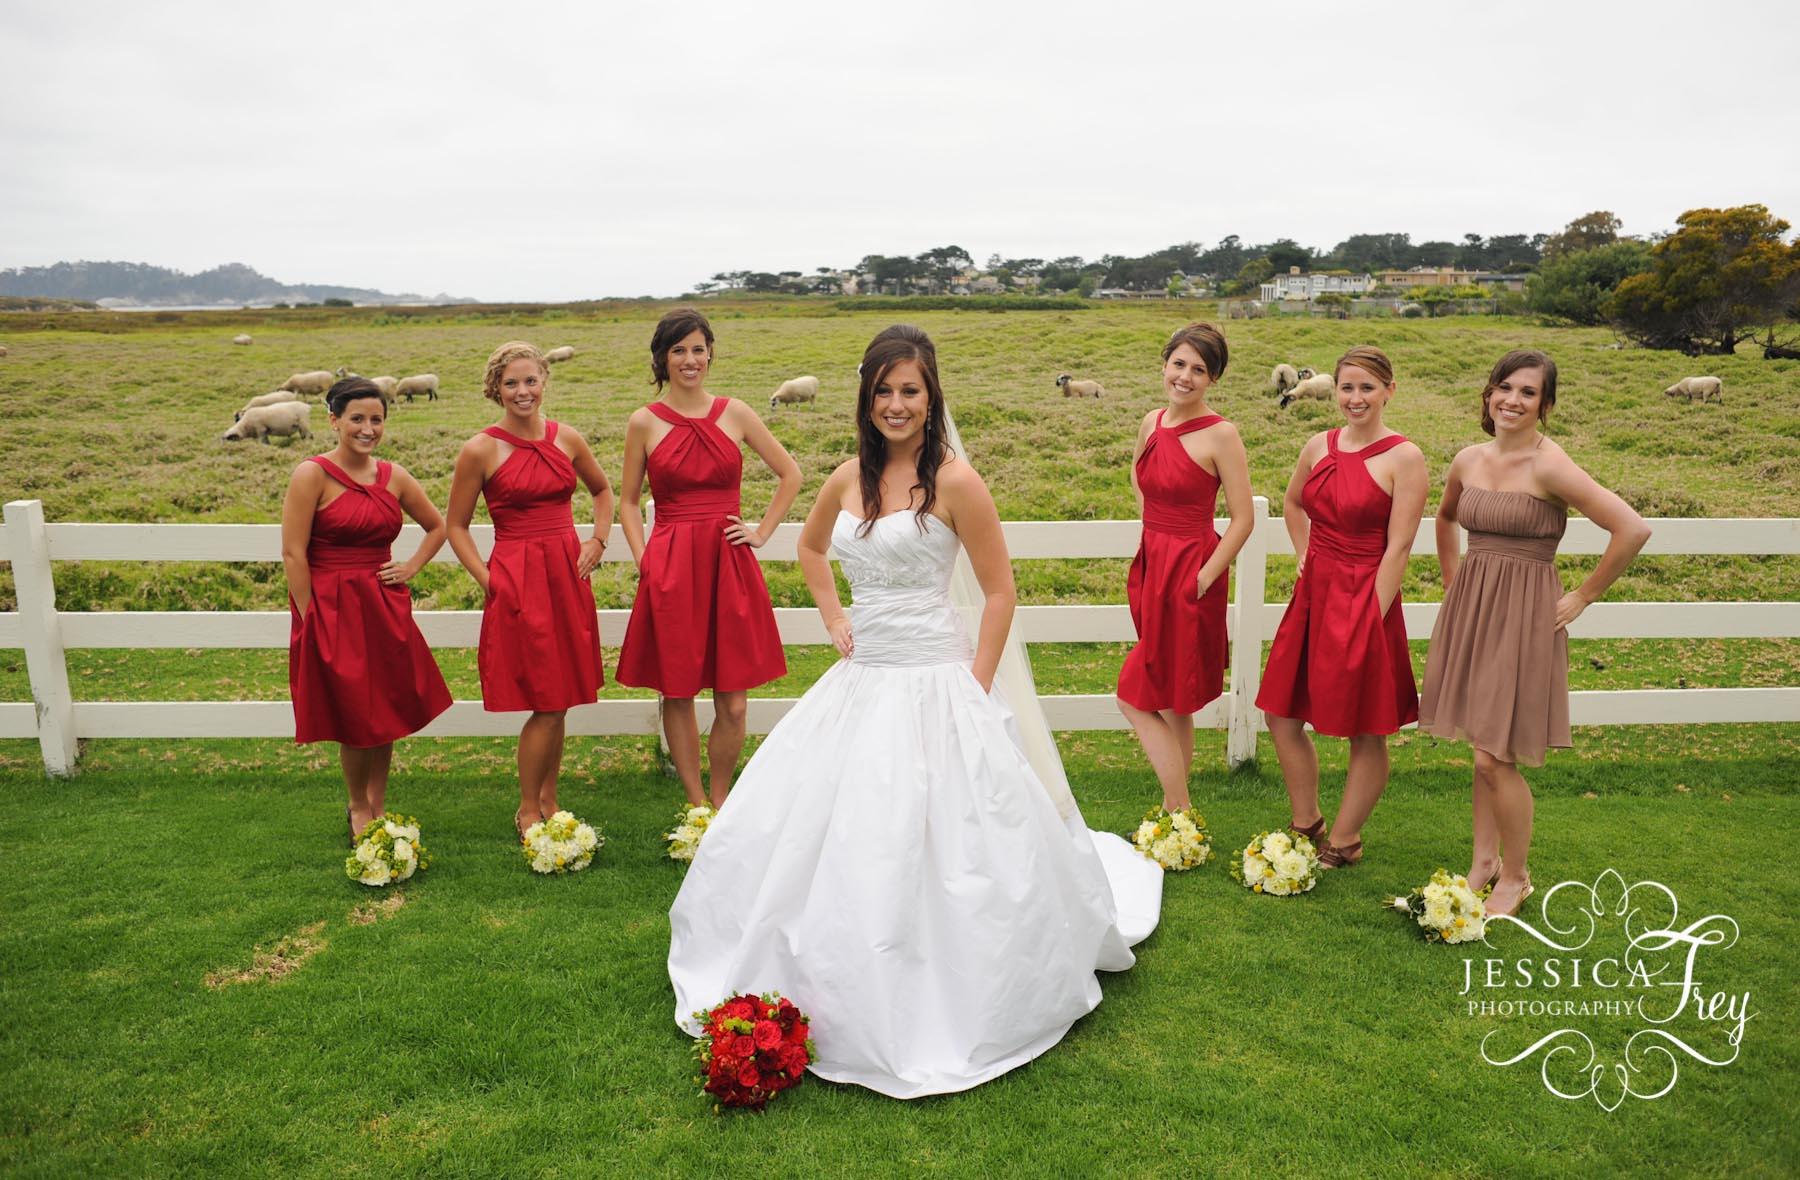 Wedding Wednesday – Bridesmaid Dresses